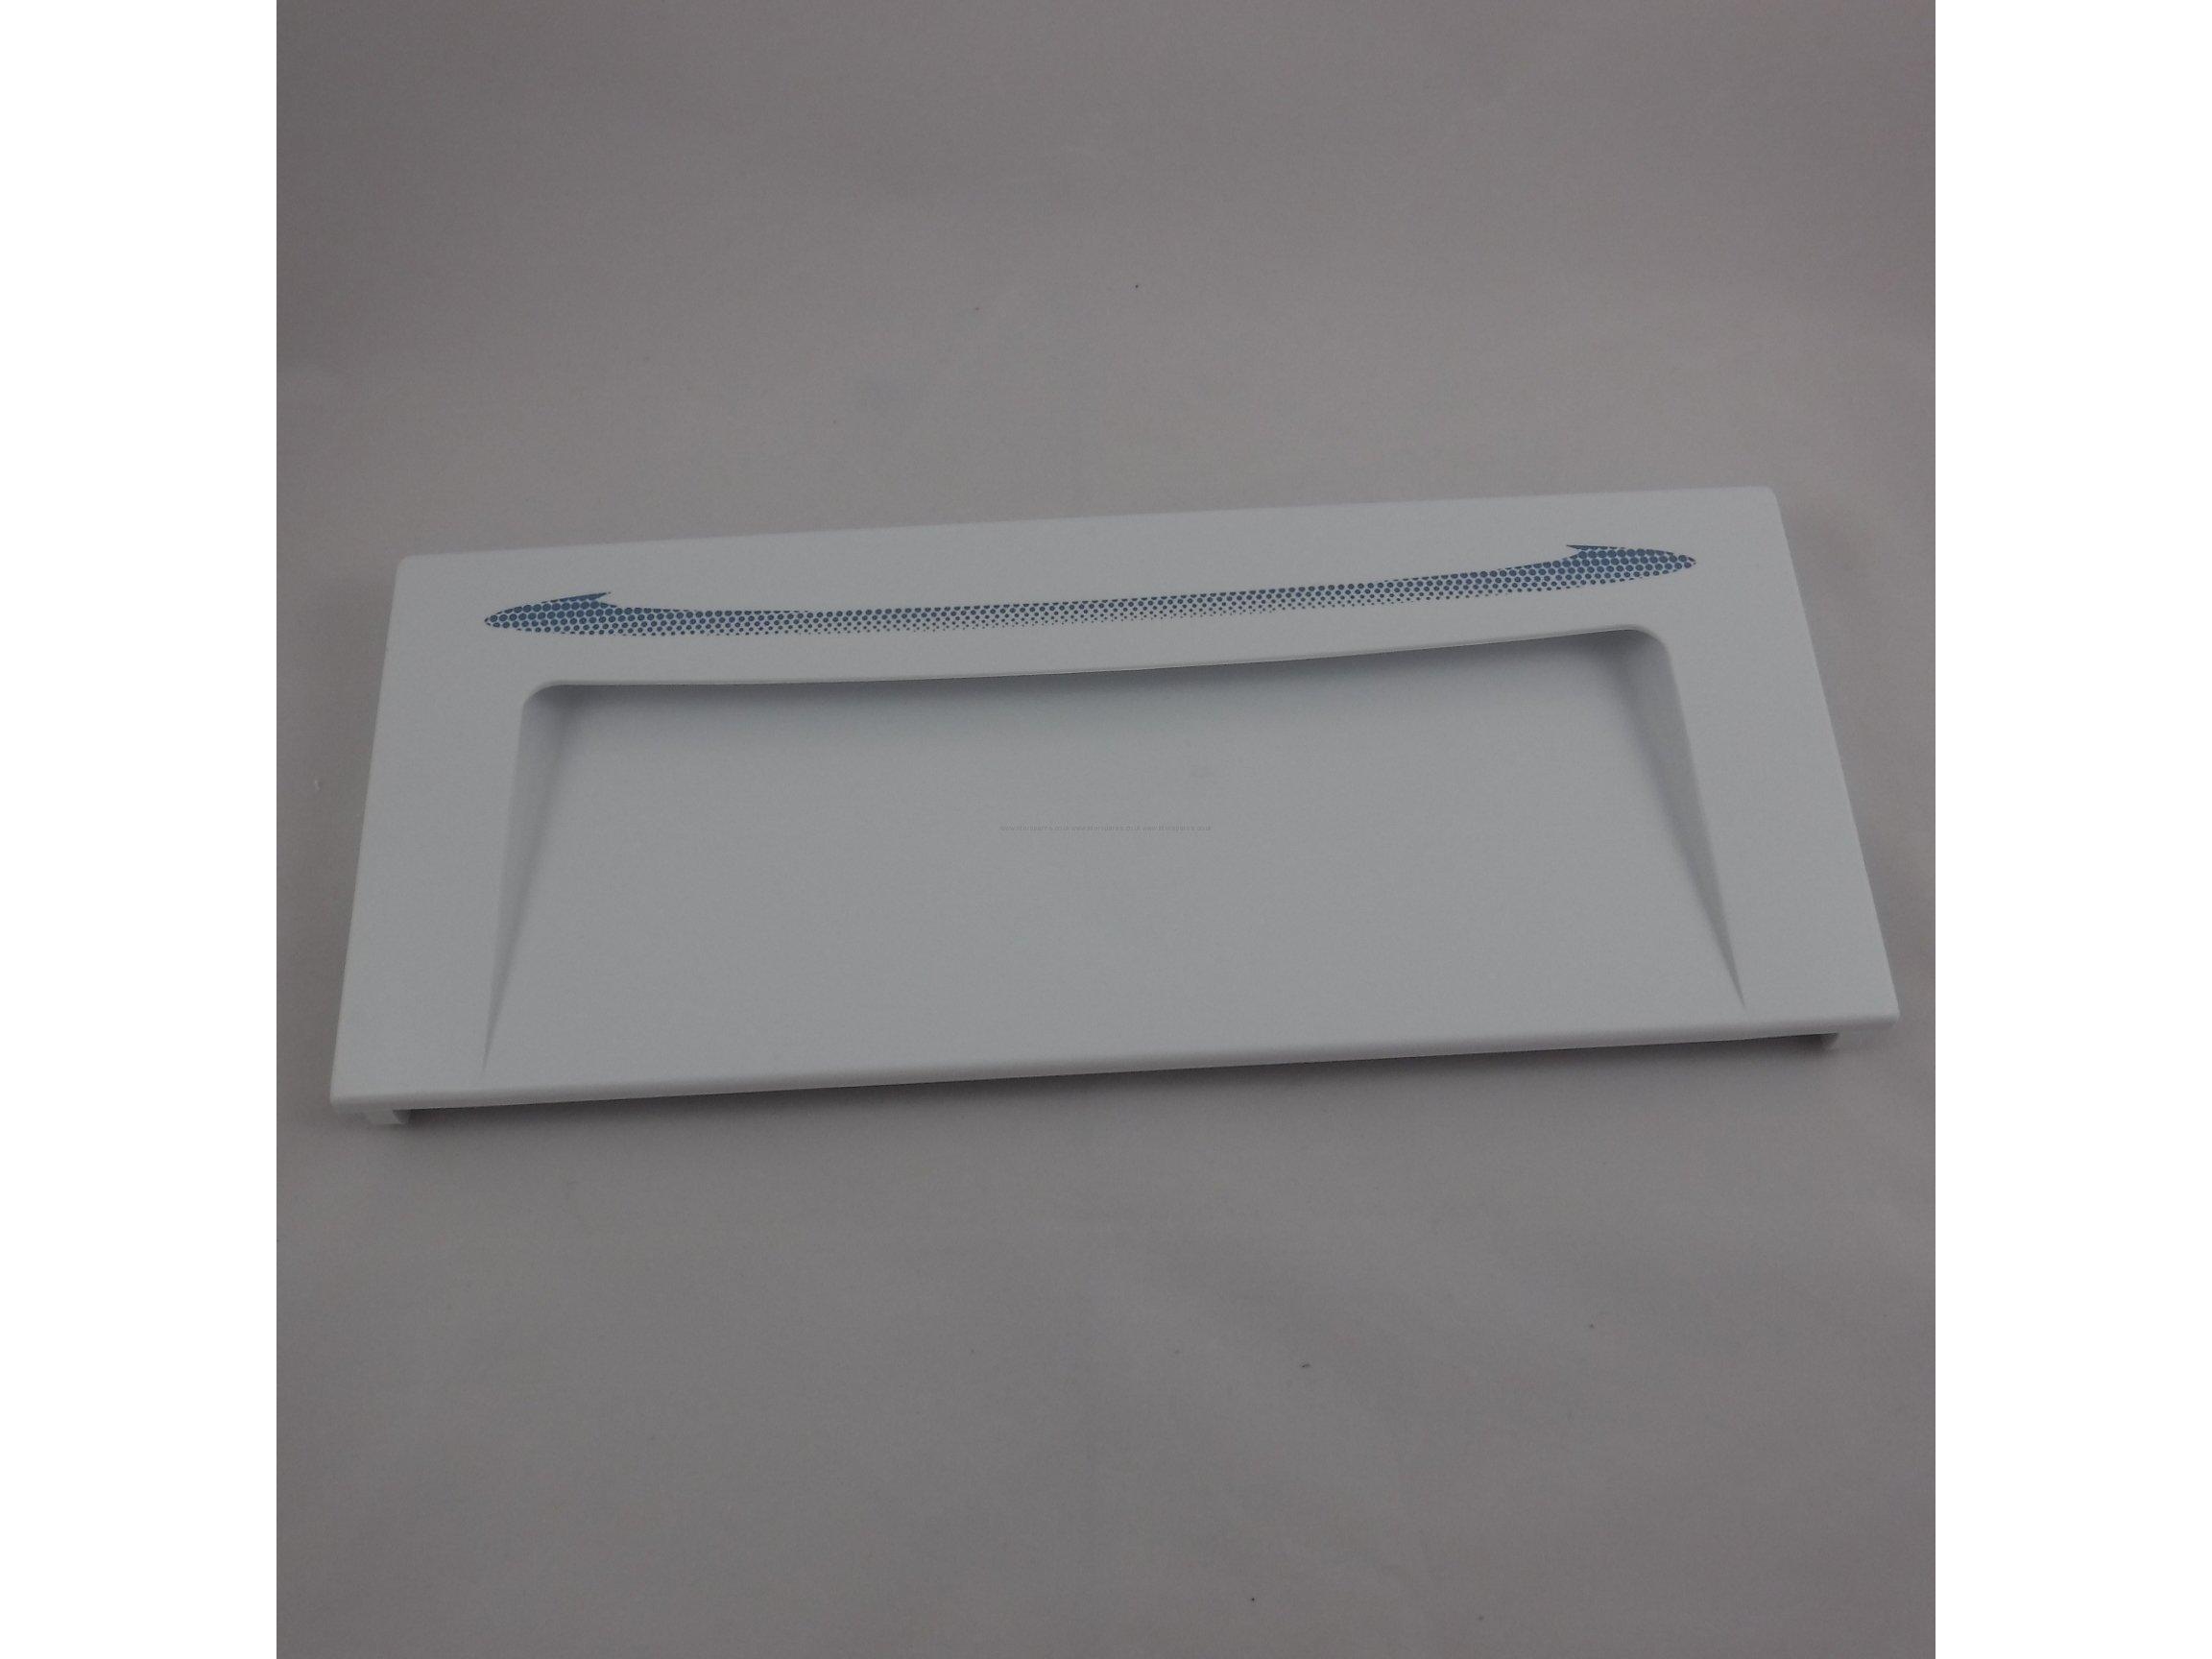 Frigidaire Fridge And Freezer Freezer Flap Door Assy